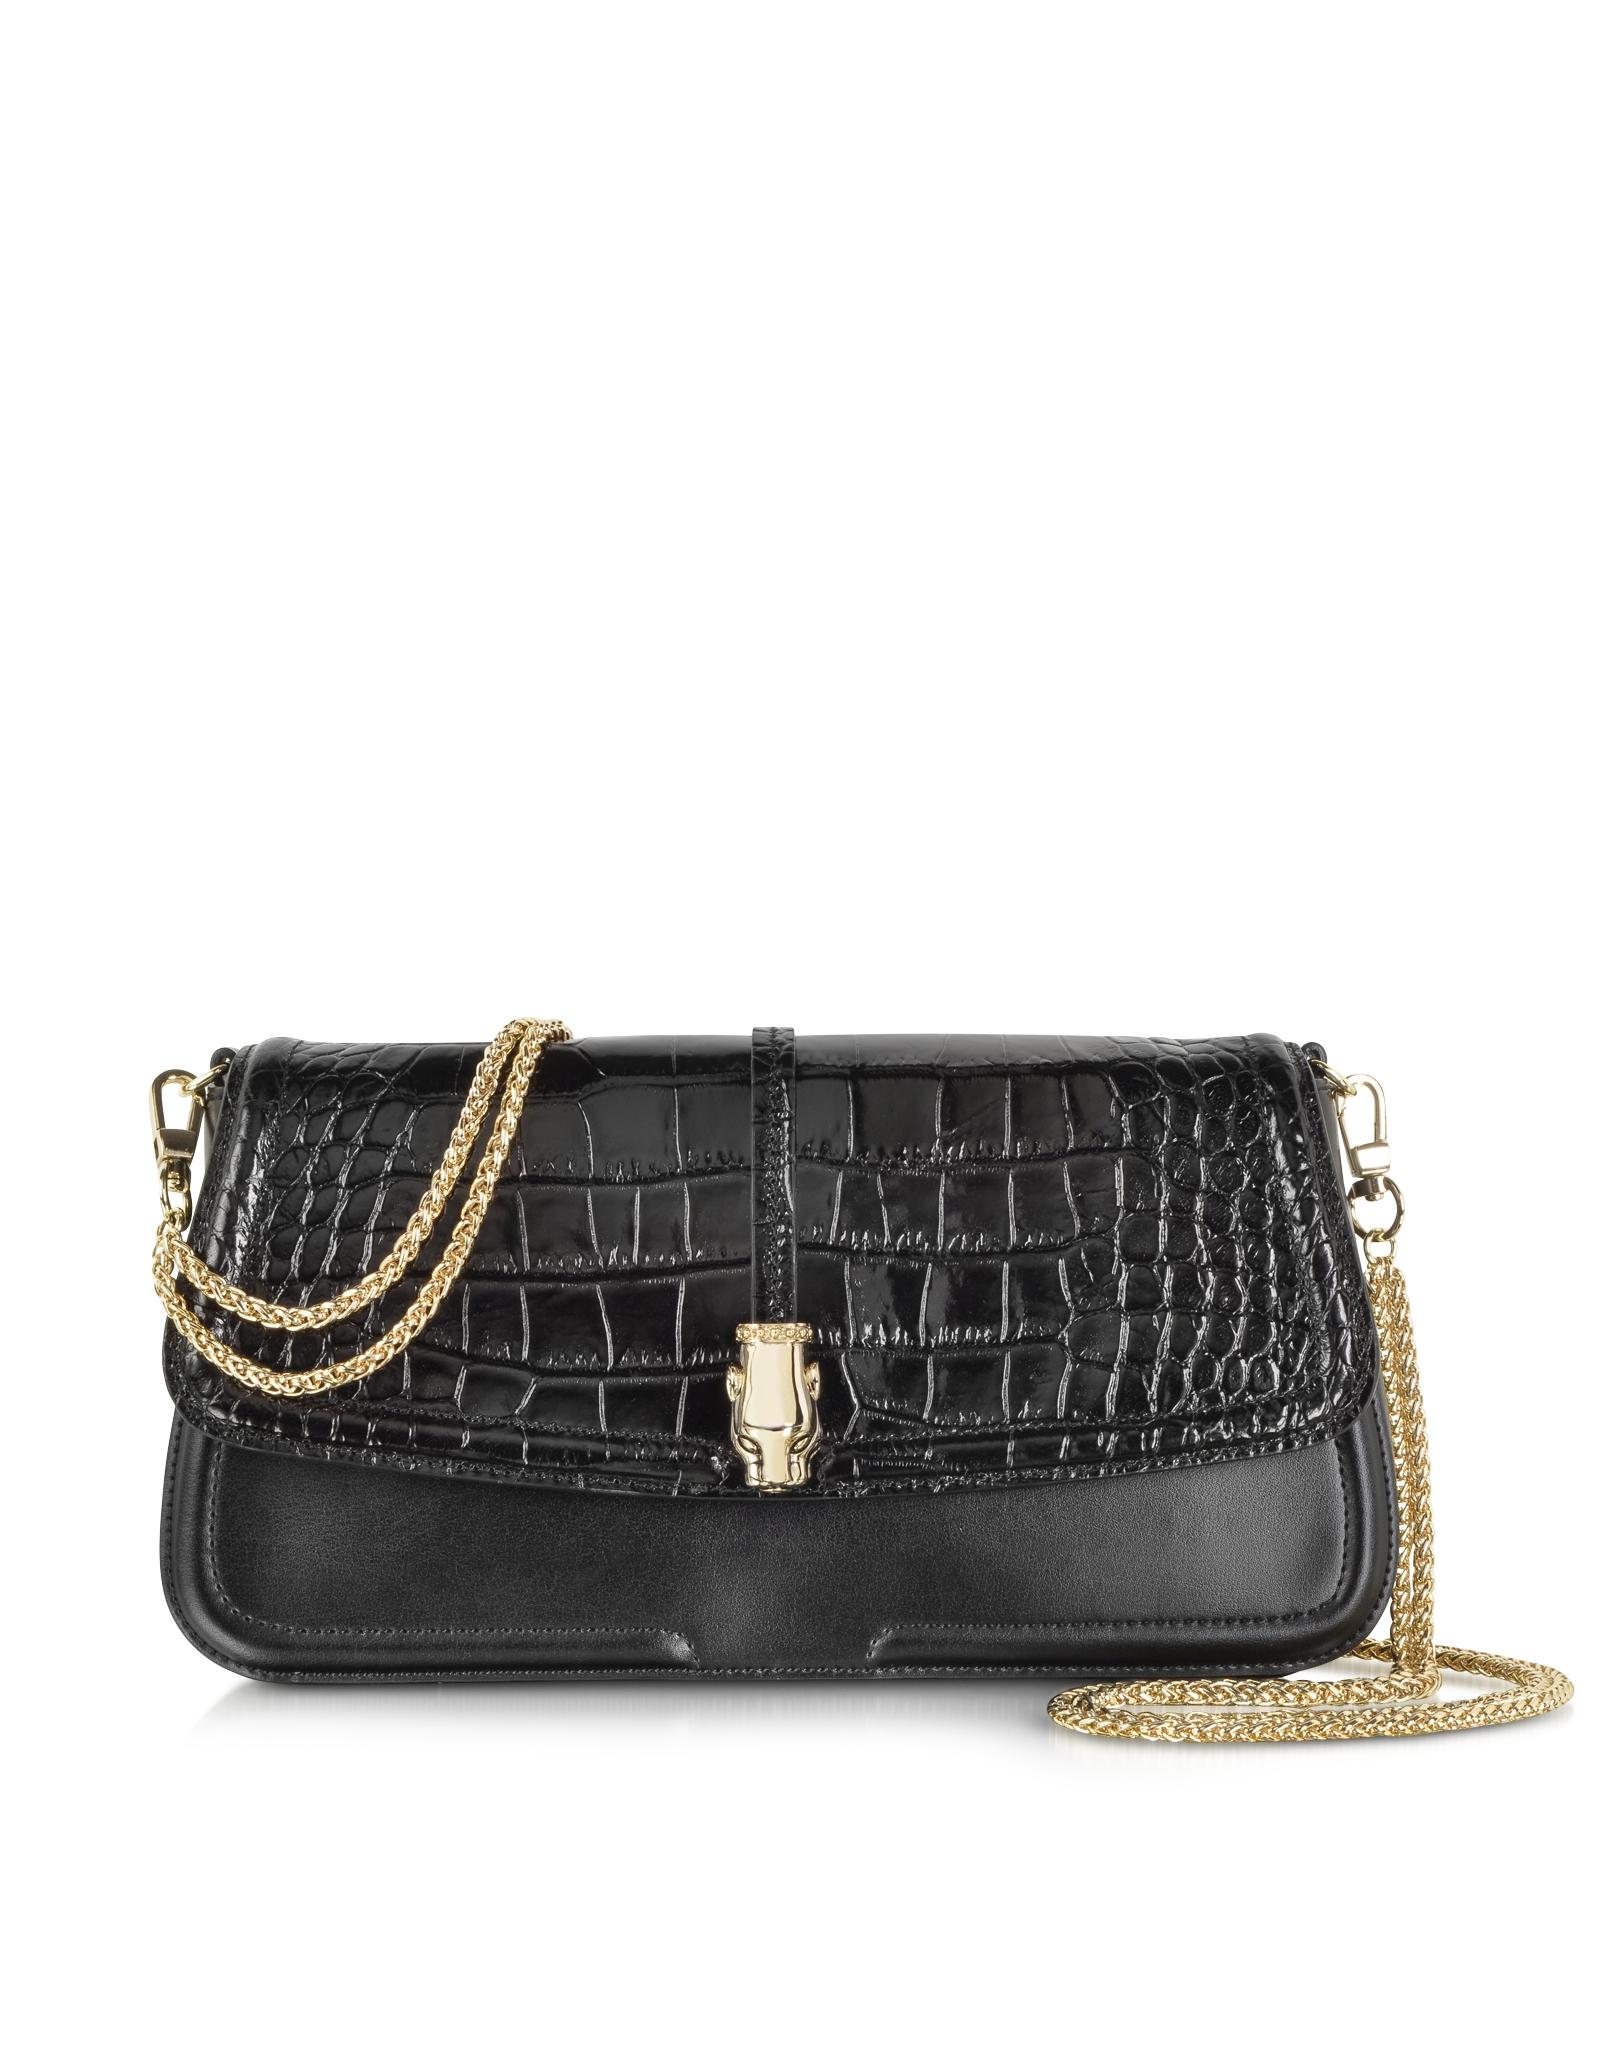 ad84cc6d4672 Class Roberto Cavalli Black Croco Print Leather Daphne Clutch in ...